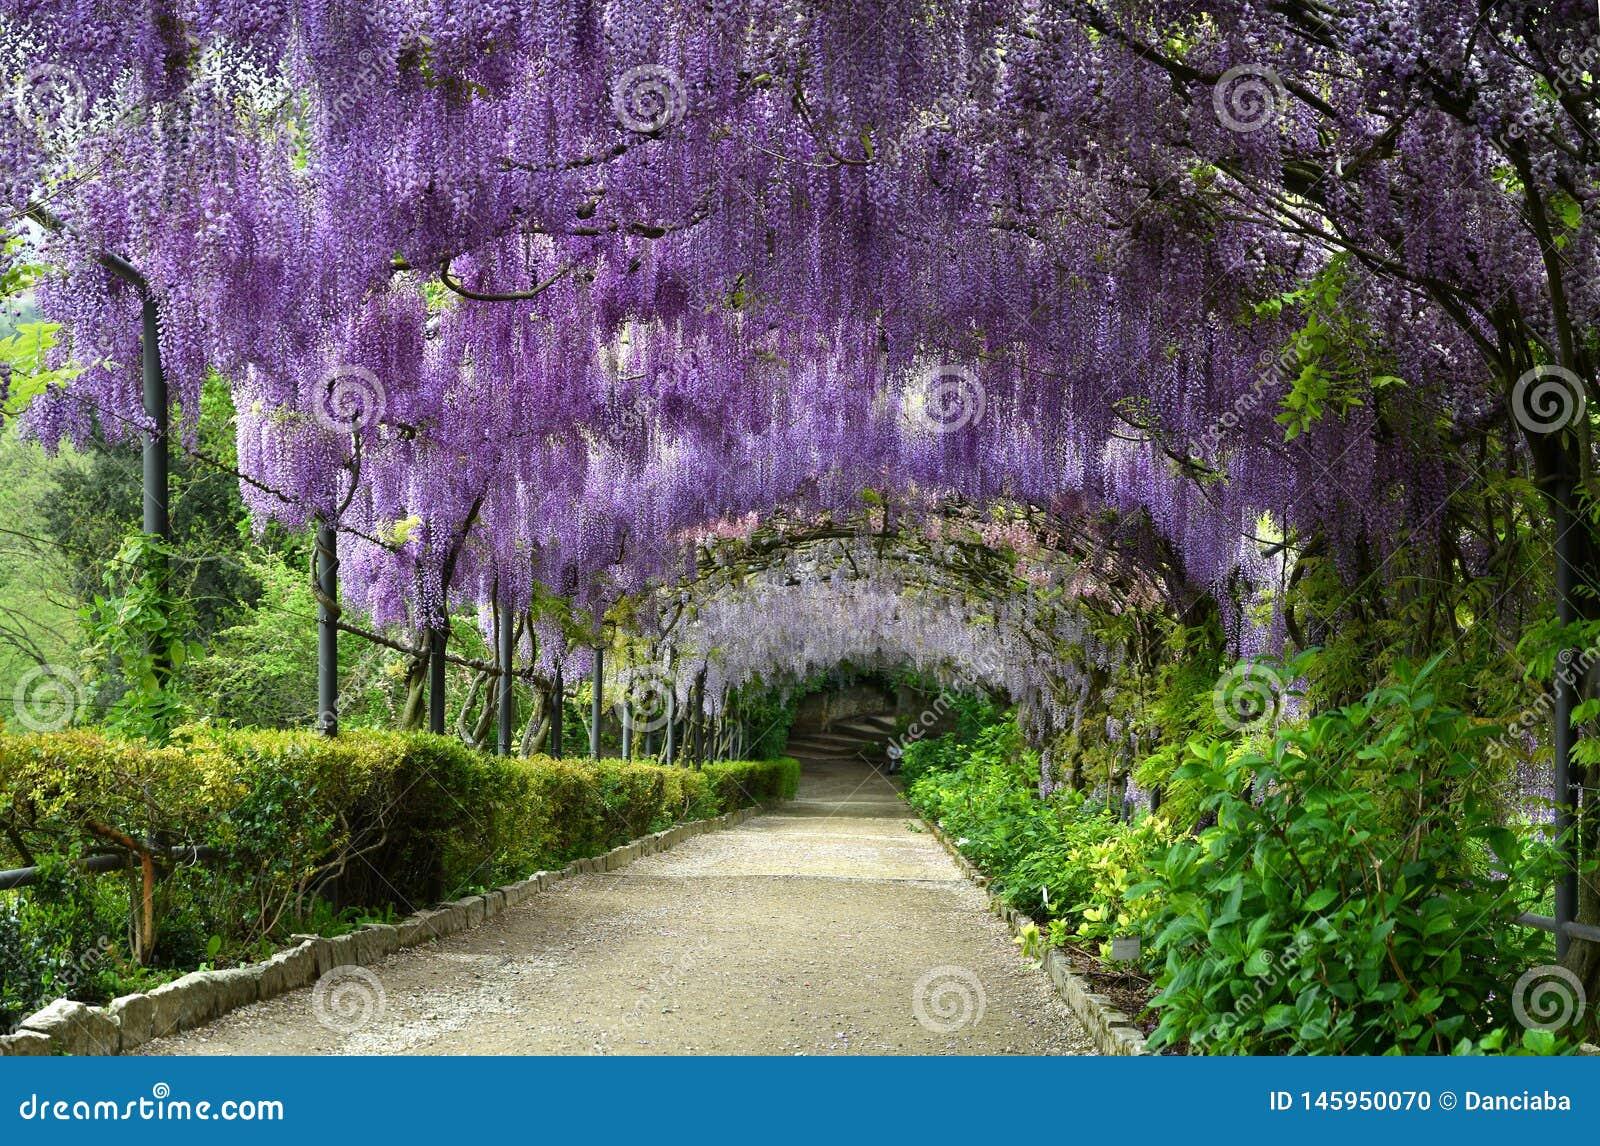 Mooie purpere wisteria in bloei bloeiende wisteriatunnel in een tuin dichtbij Piazzale Michelangelo in Florence